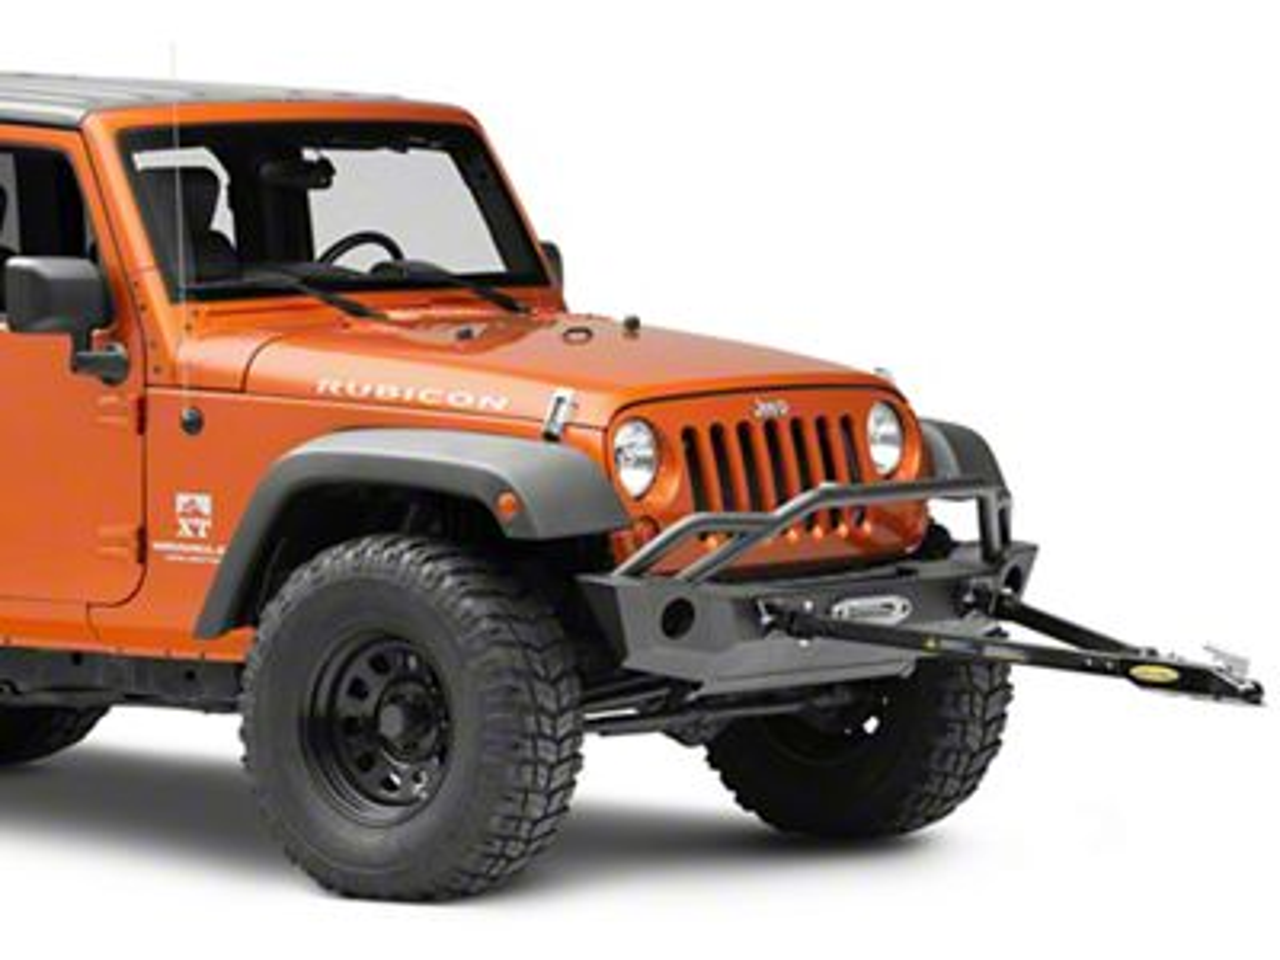 Smittybilt Jeep Wrangler Adjustable Tow Bar Kit 87450 Universal Fitment